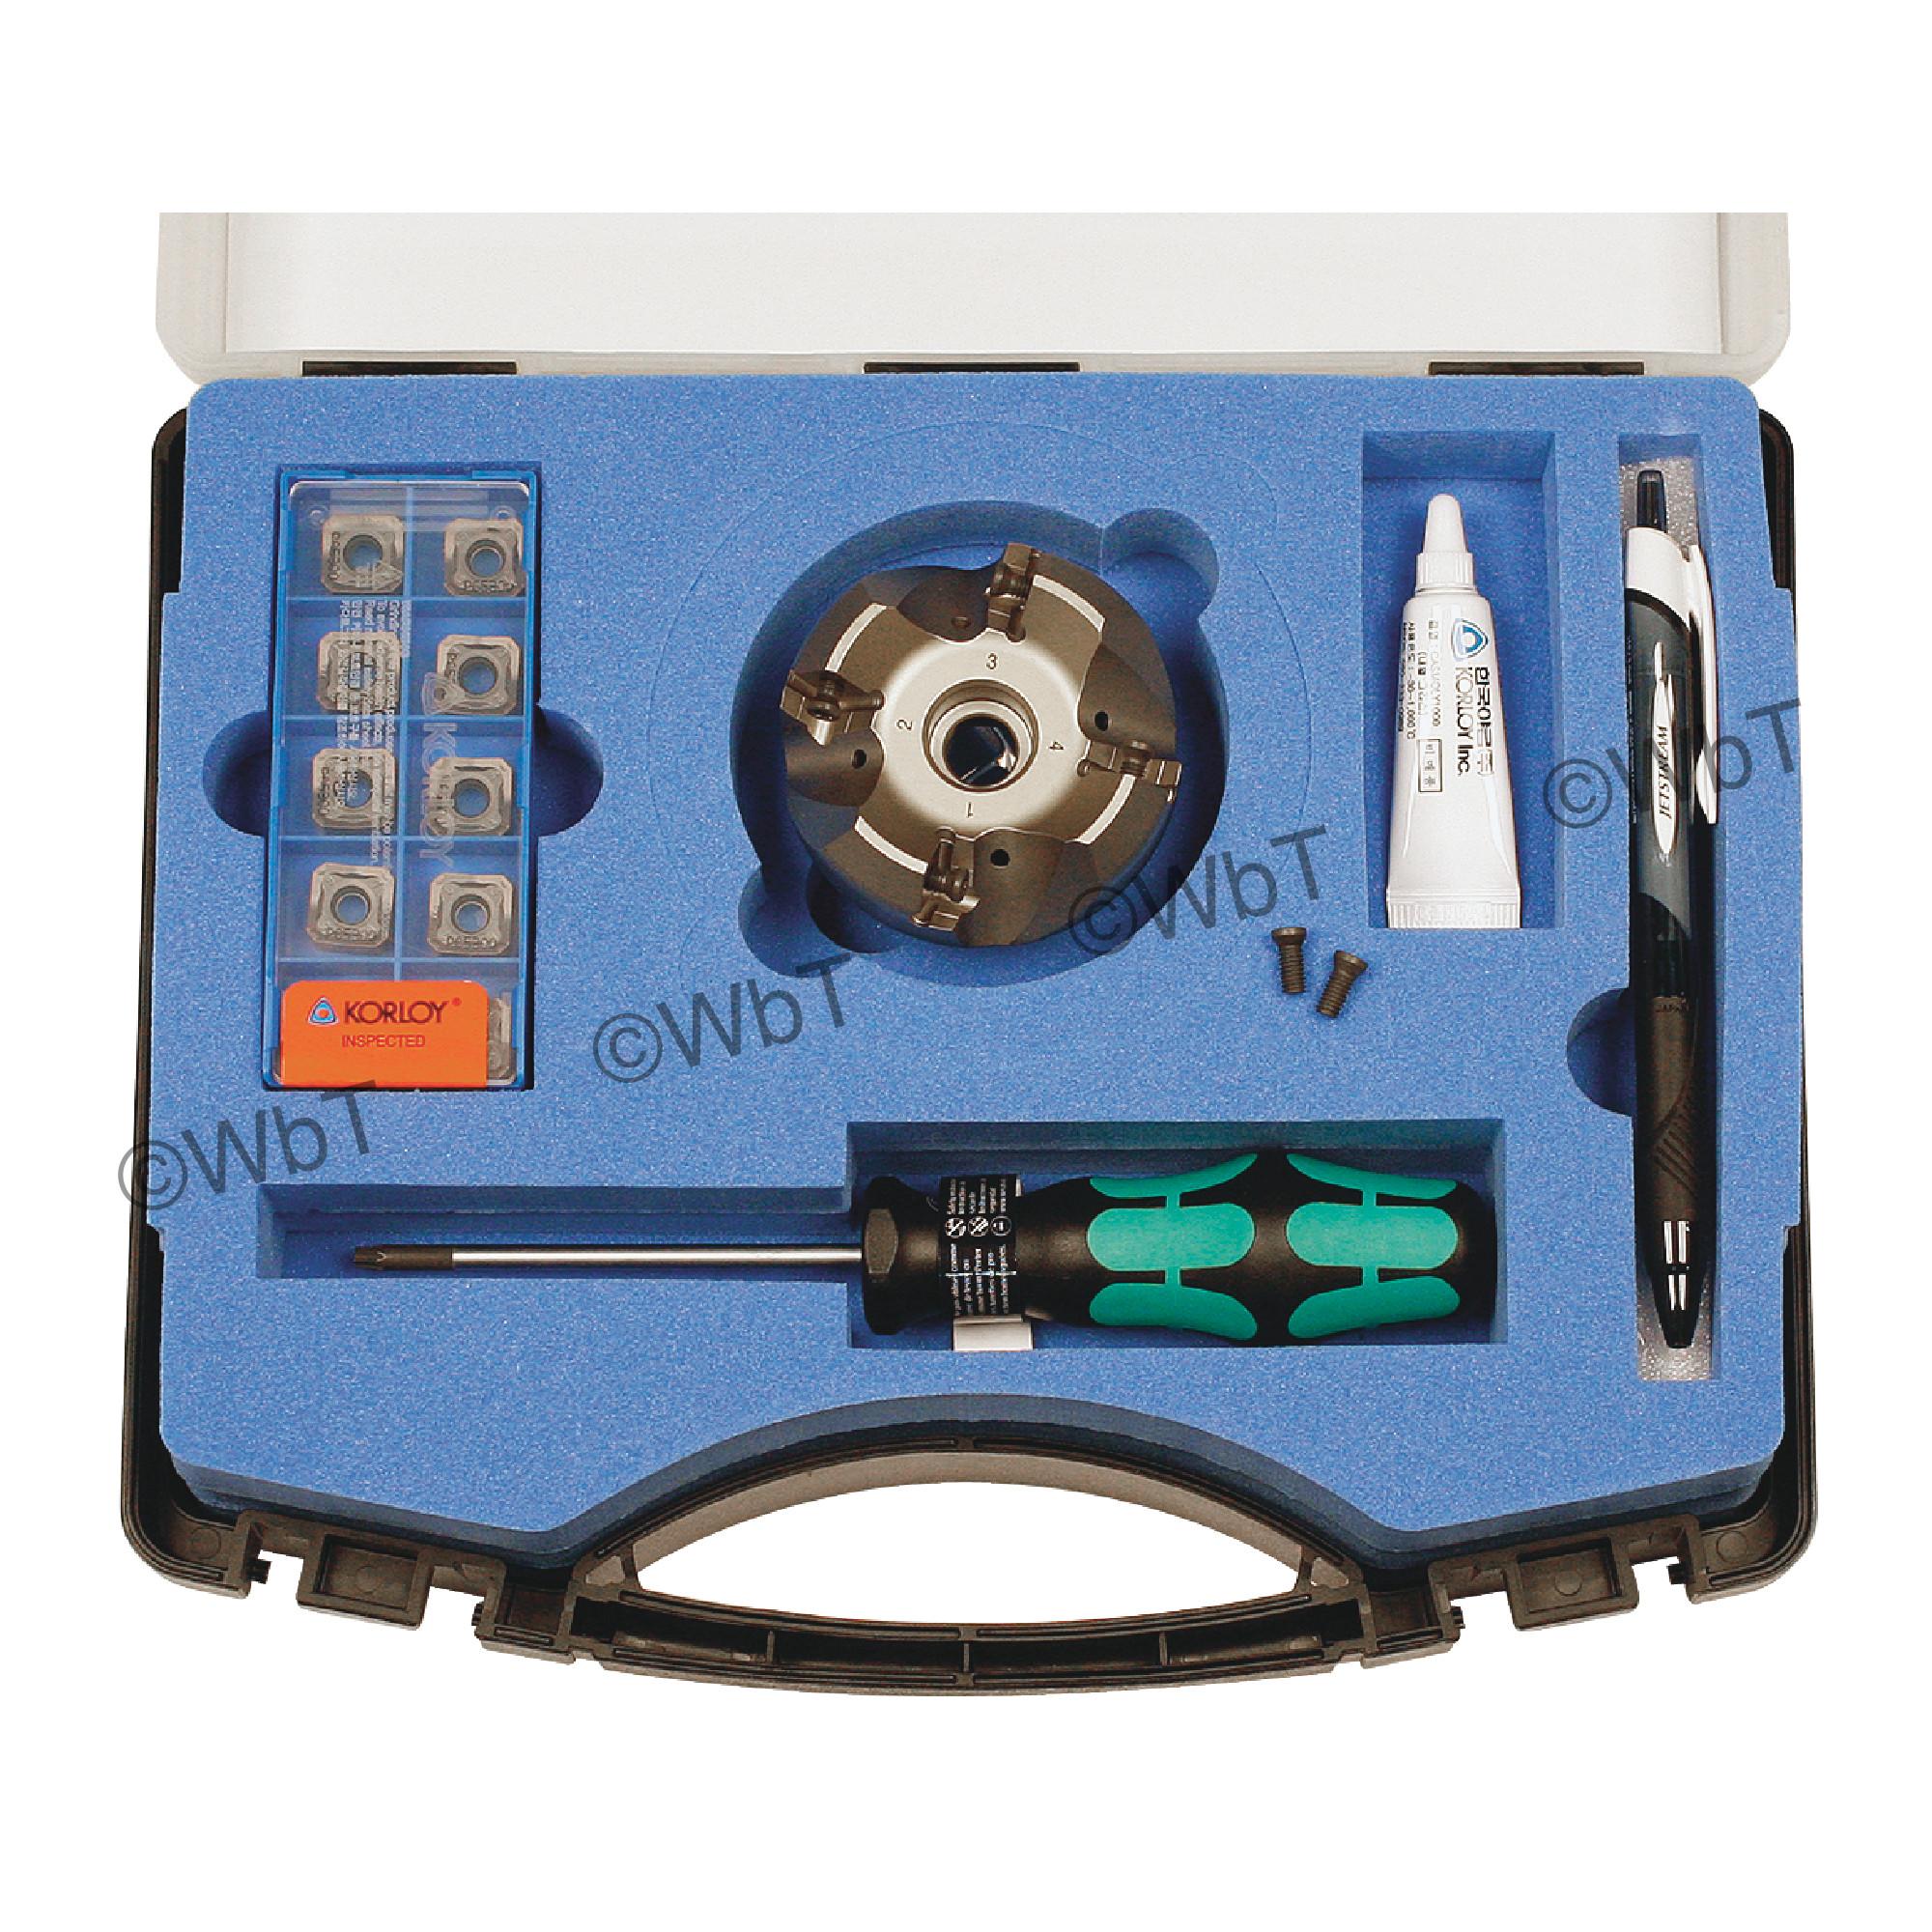 "KORLOY - 2.000"" - 45° Face Mill Set / Includes: (1) RM8ACA4200HR-M (2.0"" ø) & (10) SNMX1206ANN-MM PC5300 Coa"